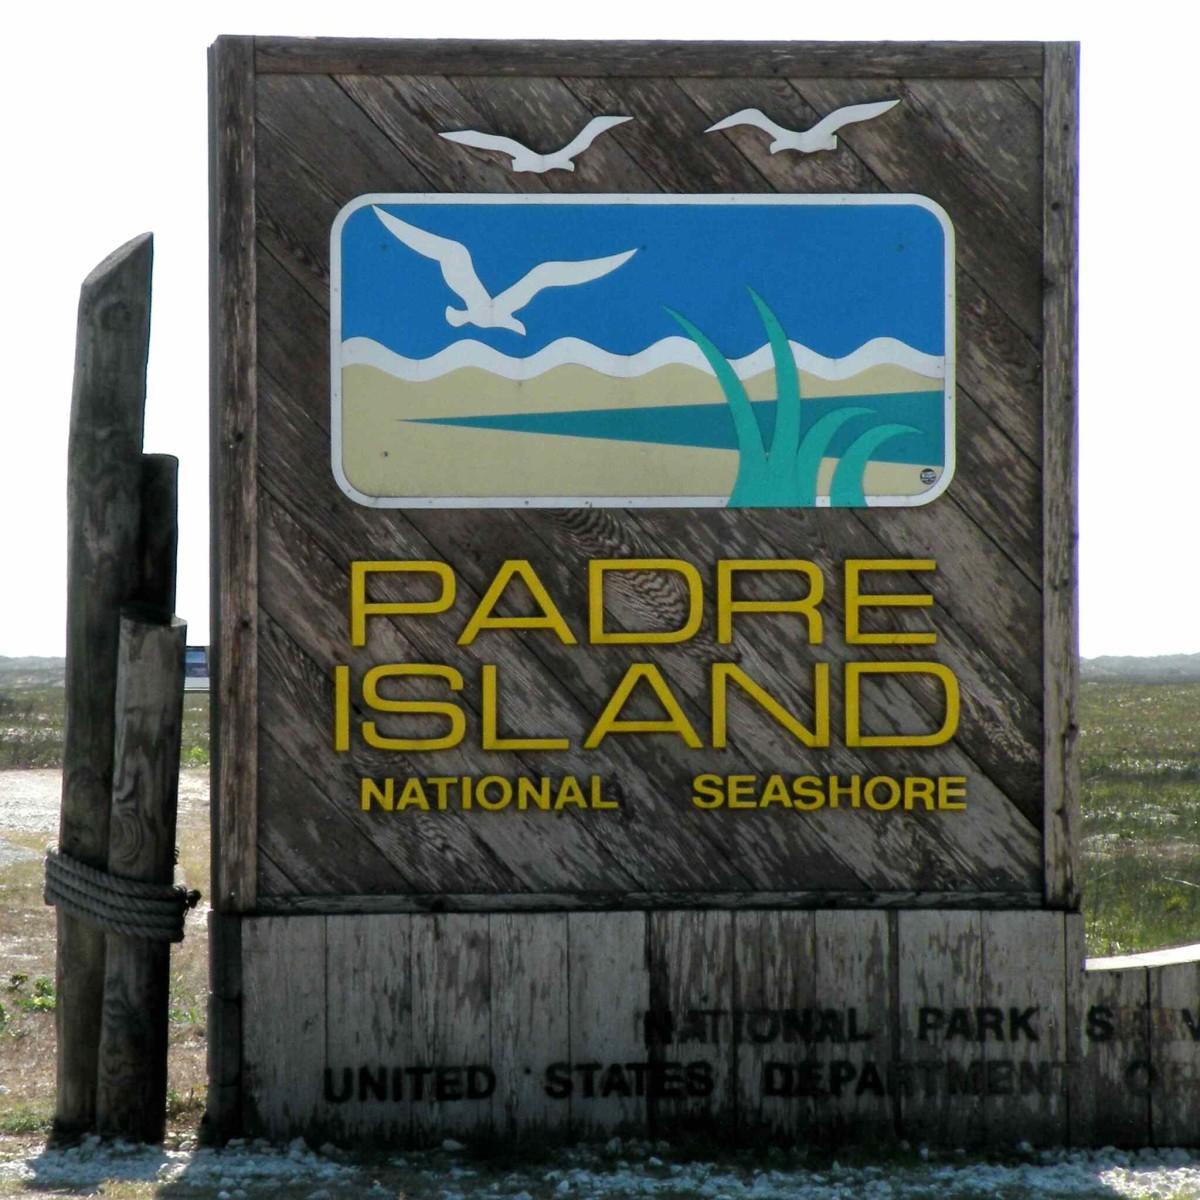 Entering Padre Island National Seashore on North Padre Island